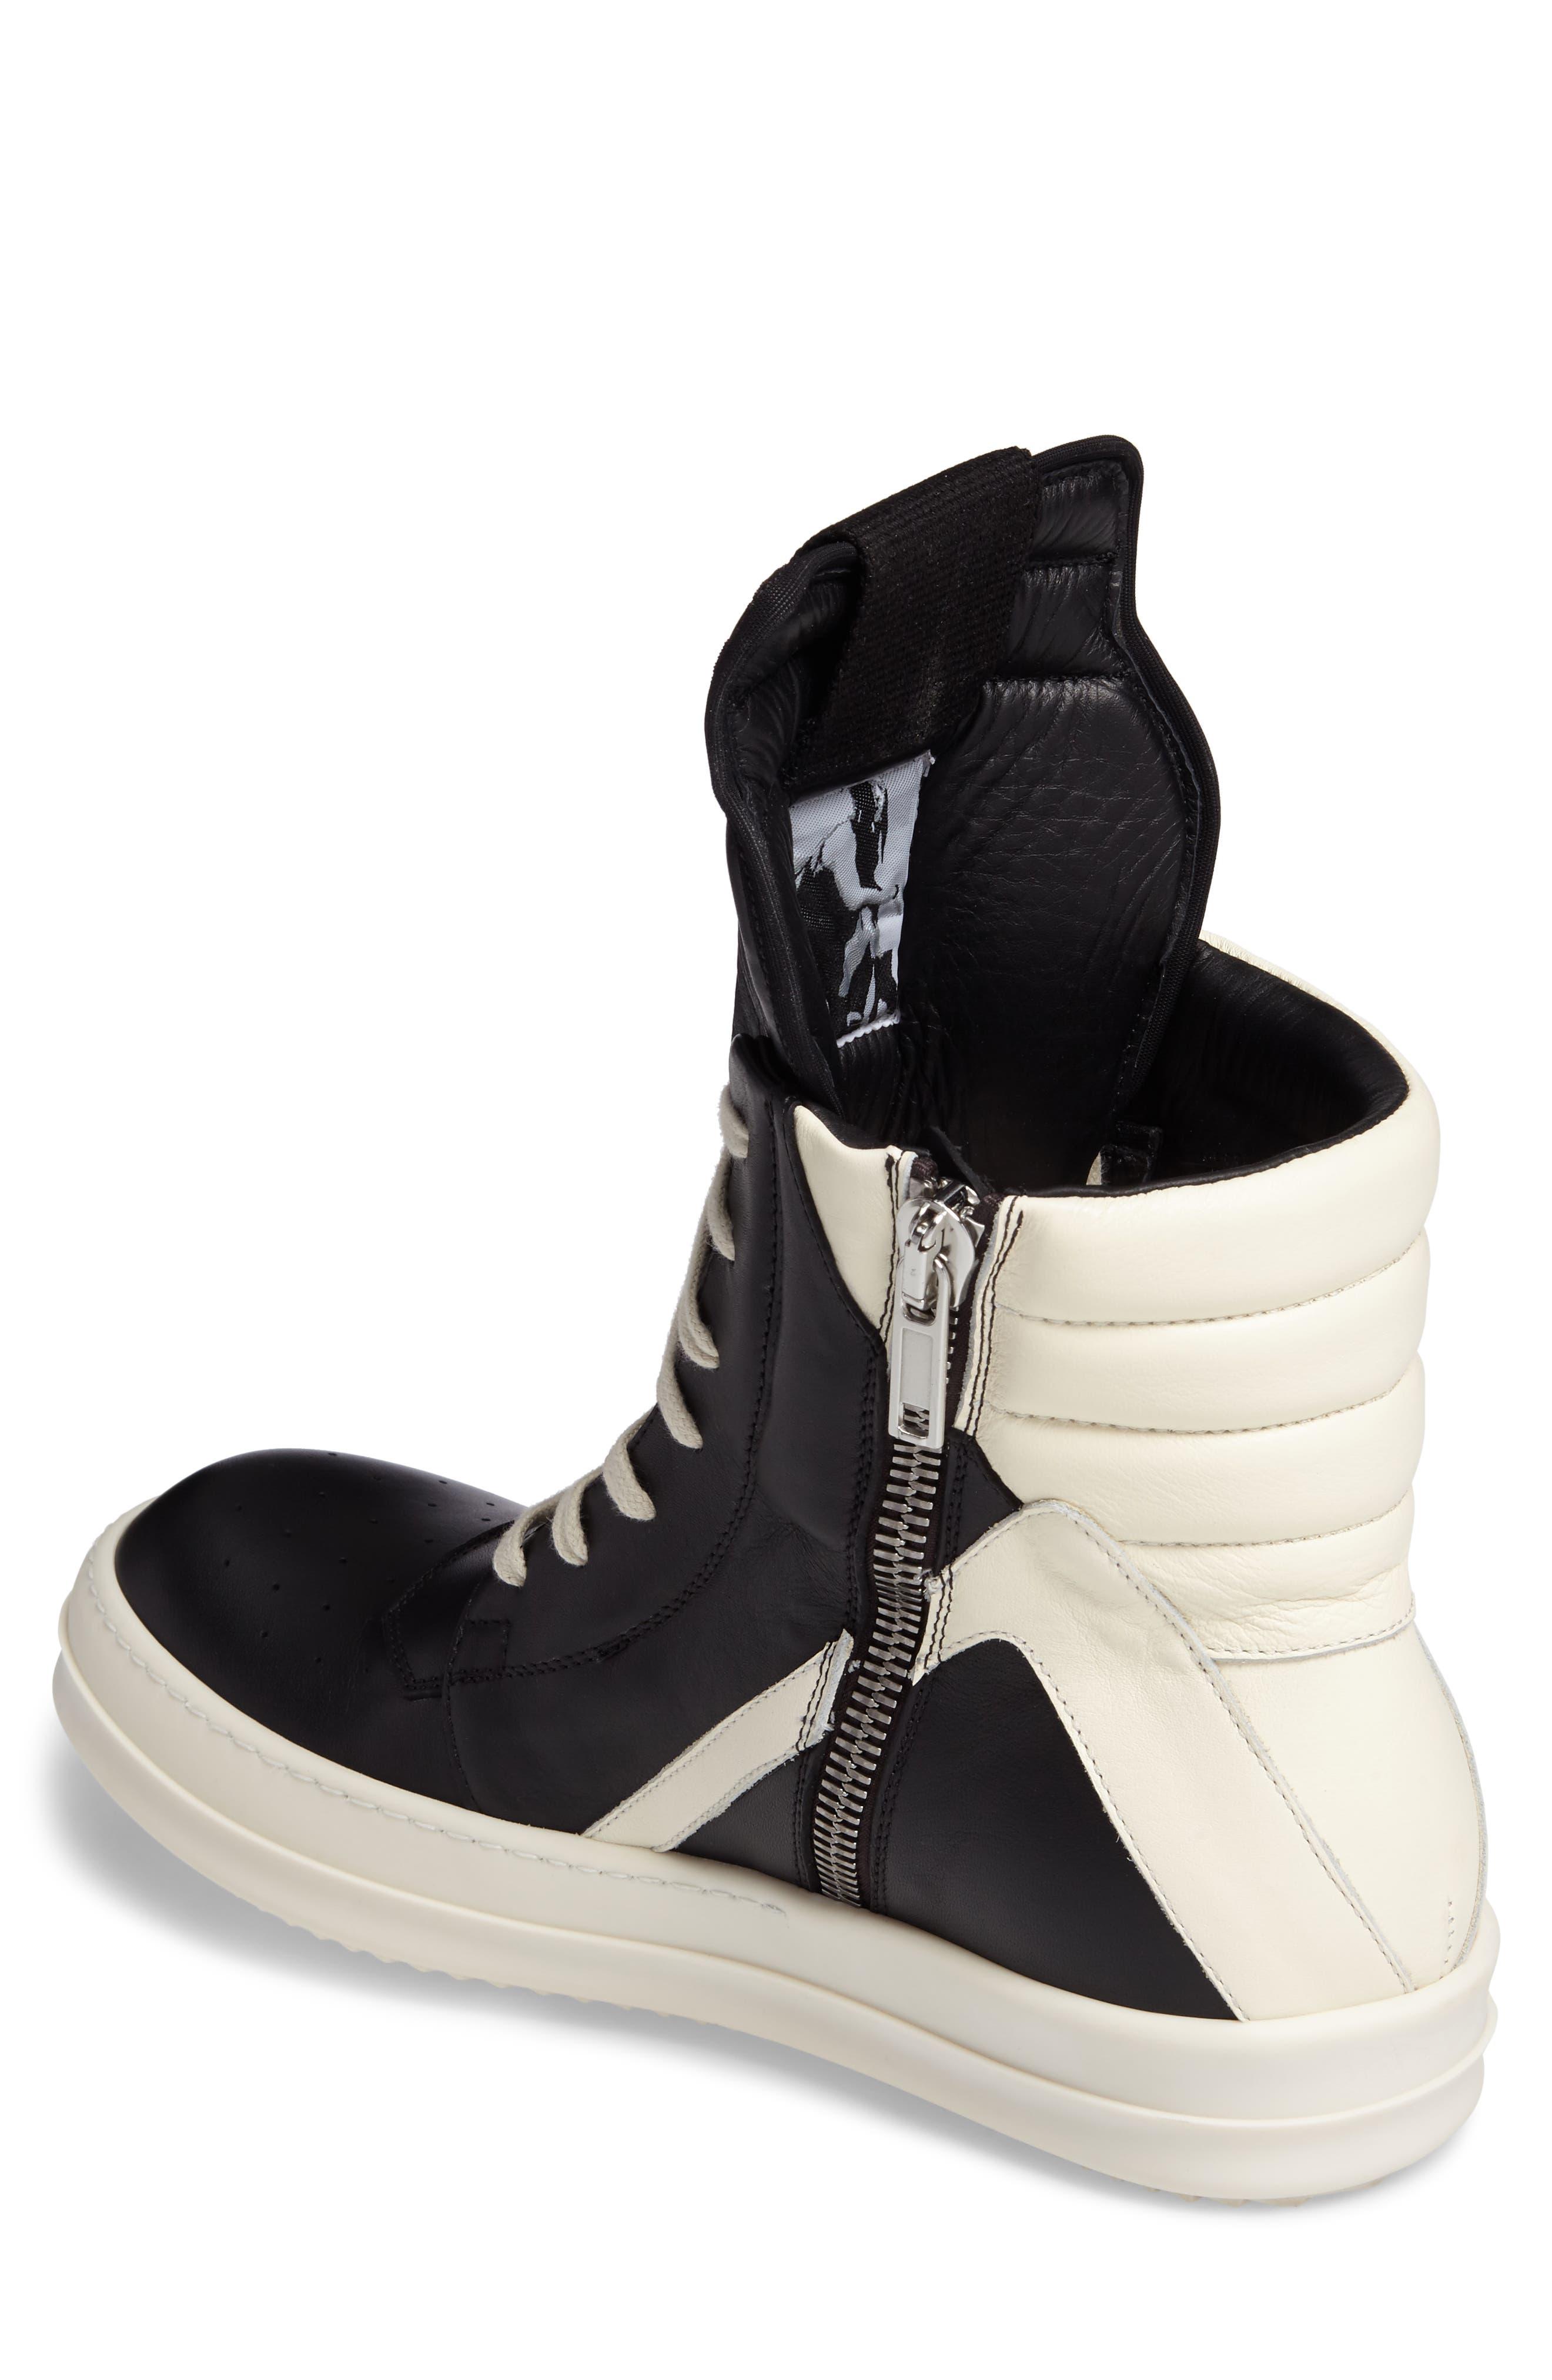 'Geobasket' High Top Sneaker,                             Alternate thumbnail 2, color,                             001